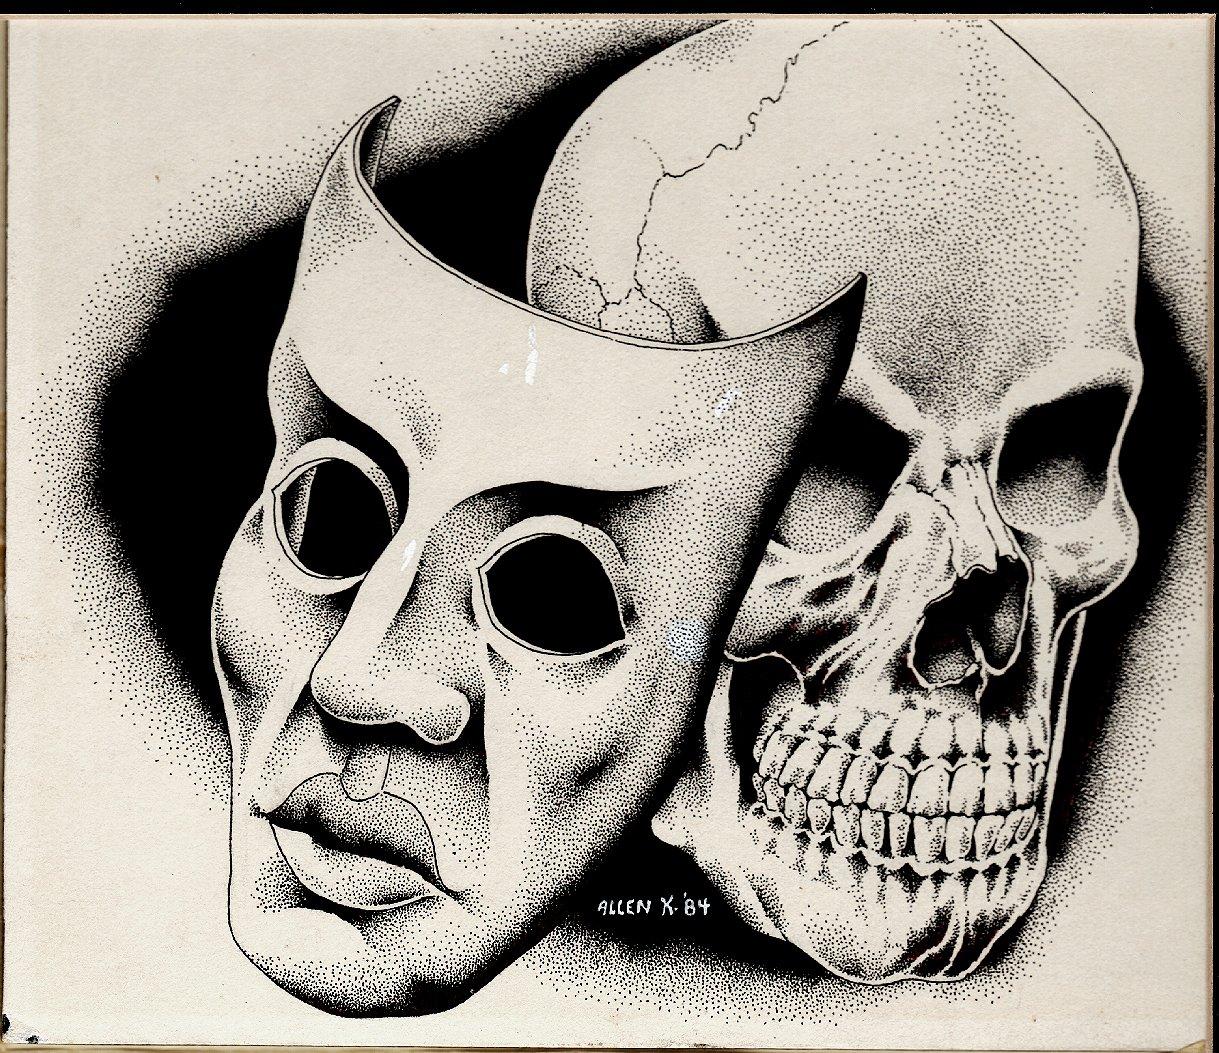 Skull & Mask Published Fanzine Pinup (1984)